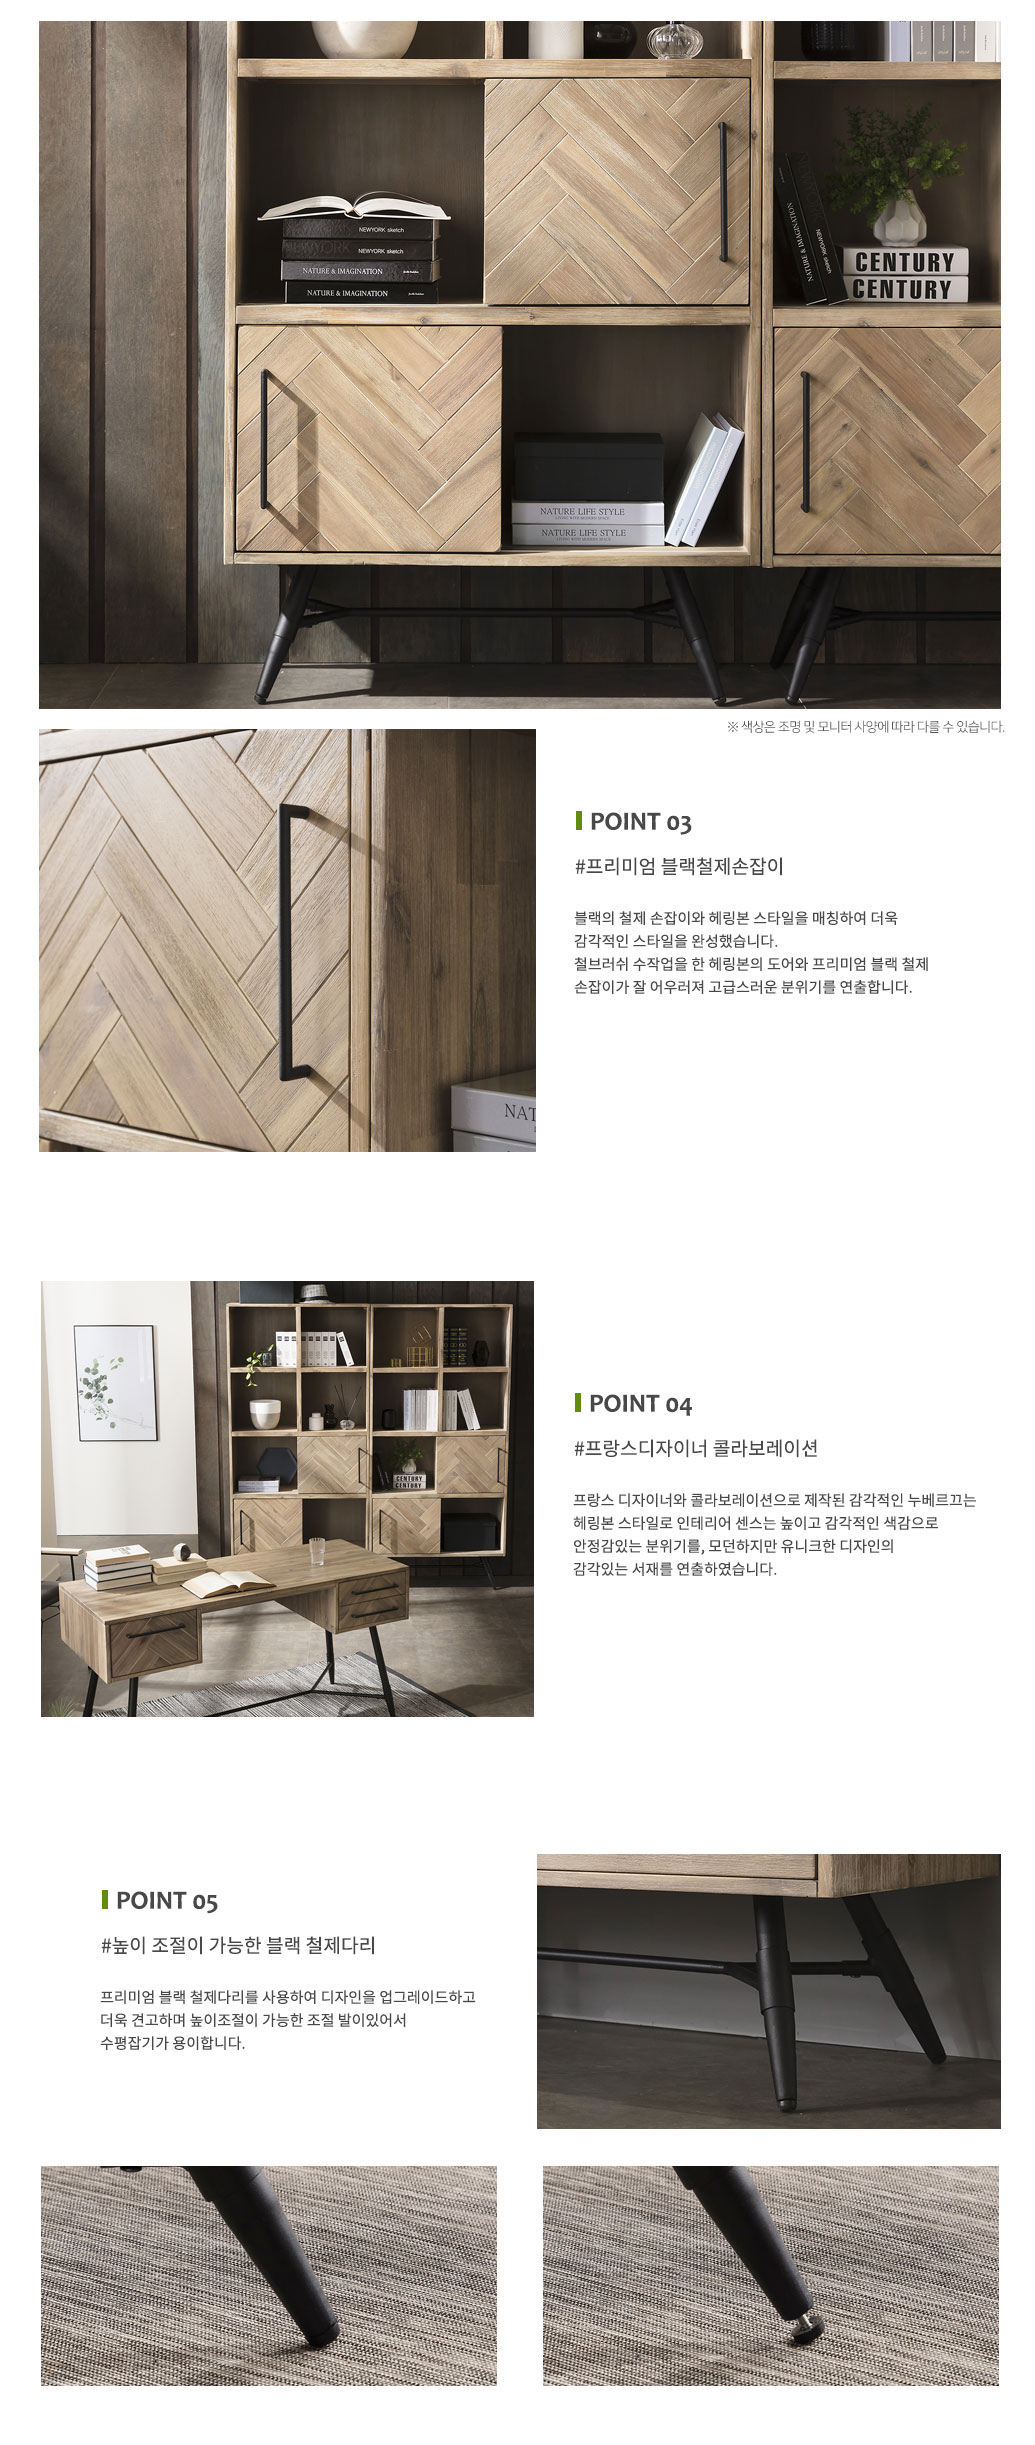 nouverc_bookcase_05.jpg